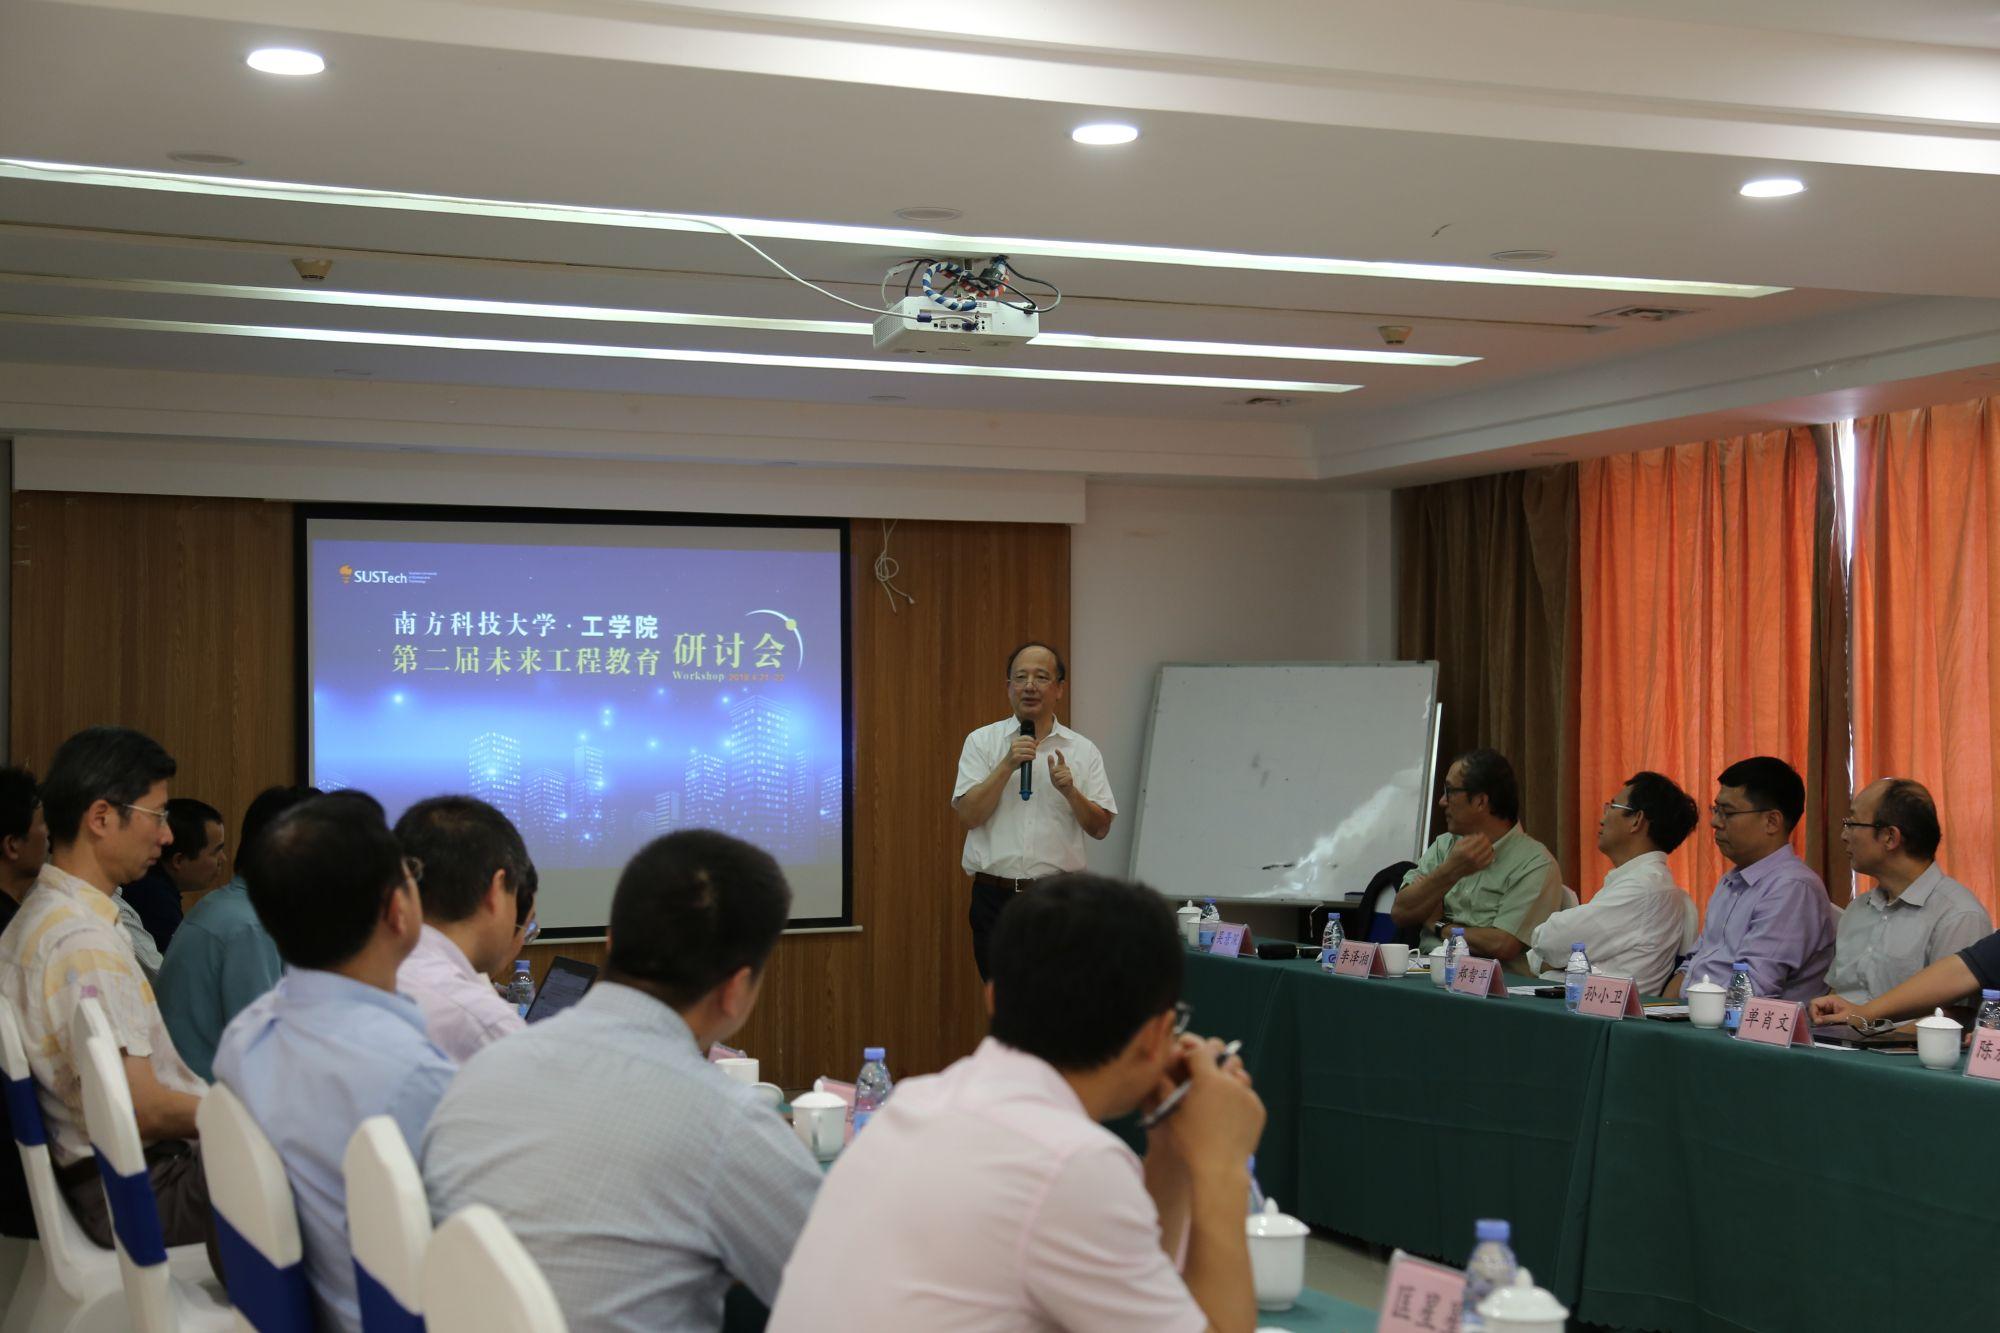 Second Future Engineering Education Seminar Held at SUSTech